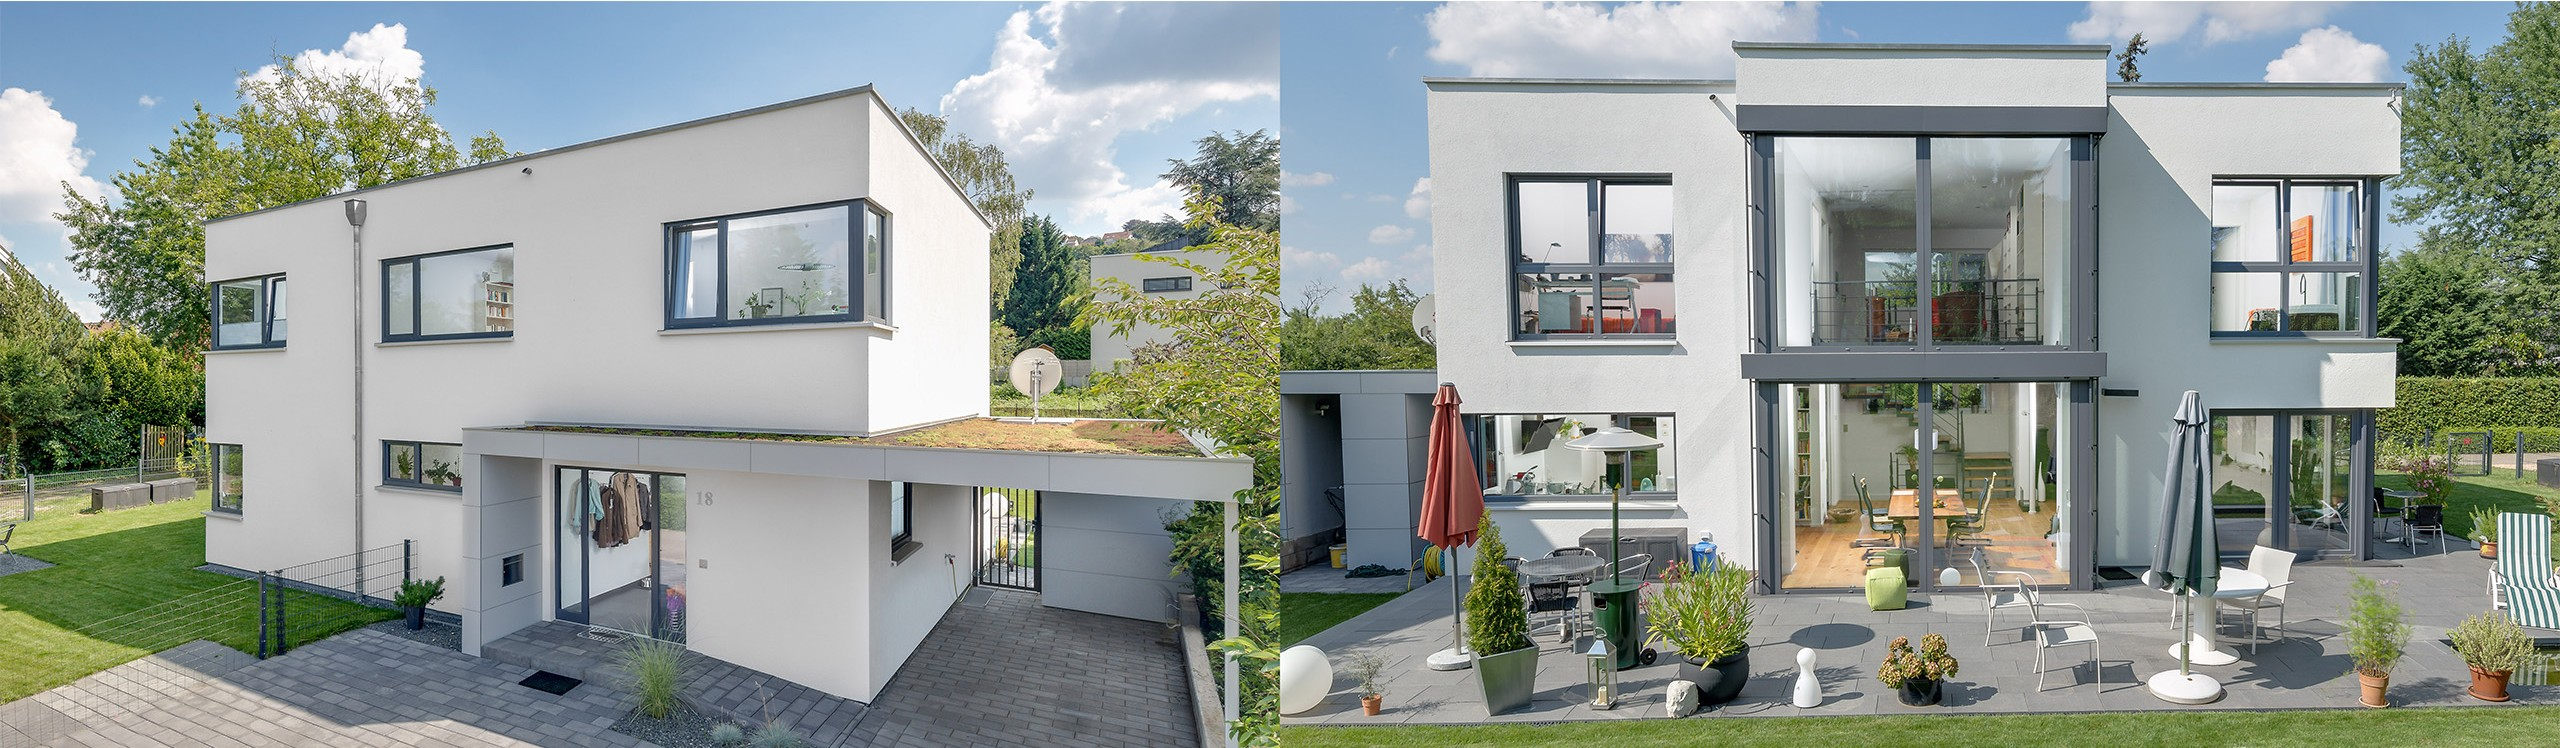 00022-Fotograf-Architektur-Achitecture-exterior-Werbefotograf-Stuttgart-Andreas-Martin